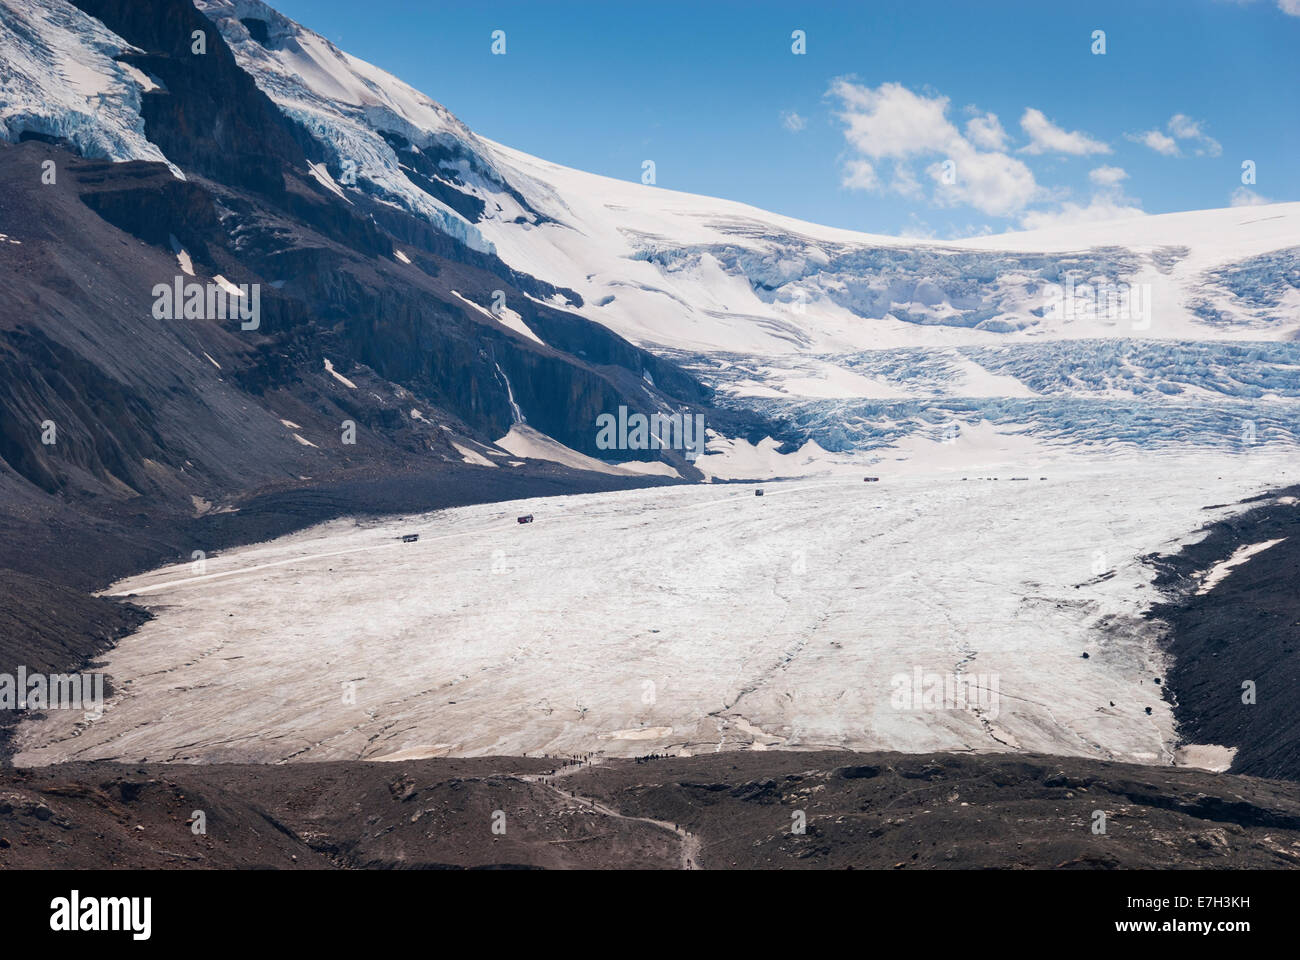 Elk203-7412 Canada, Alberta, Jasper National Park, Columbia Icefield, Athabasca Glacier - Stock Image